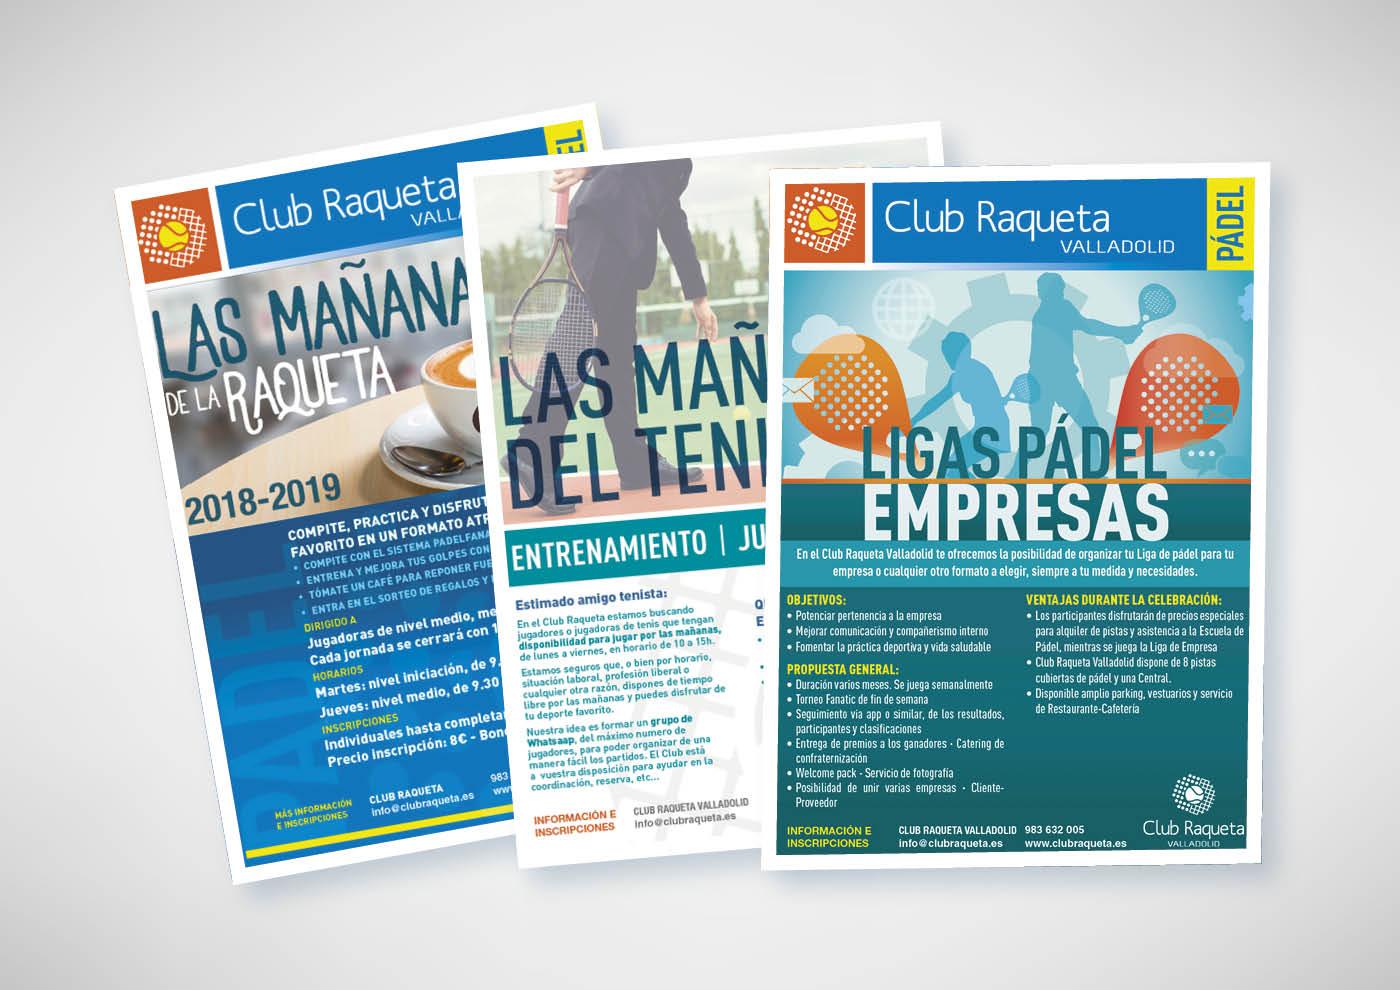 Club Raqueta Valladolid - 5º aniversario - Ivan Diez